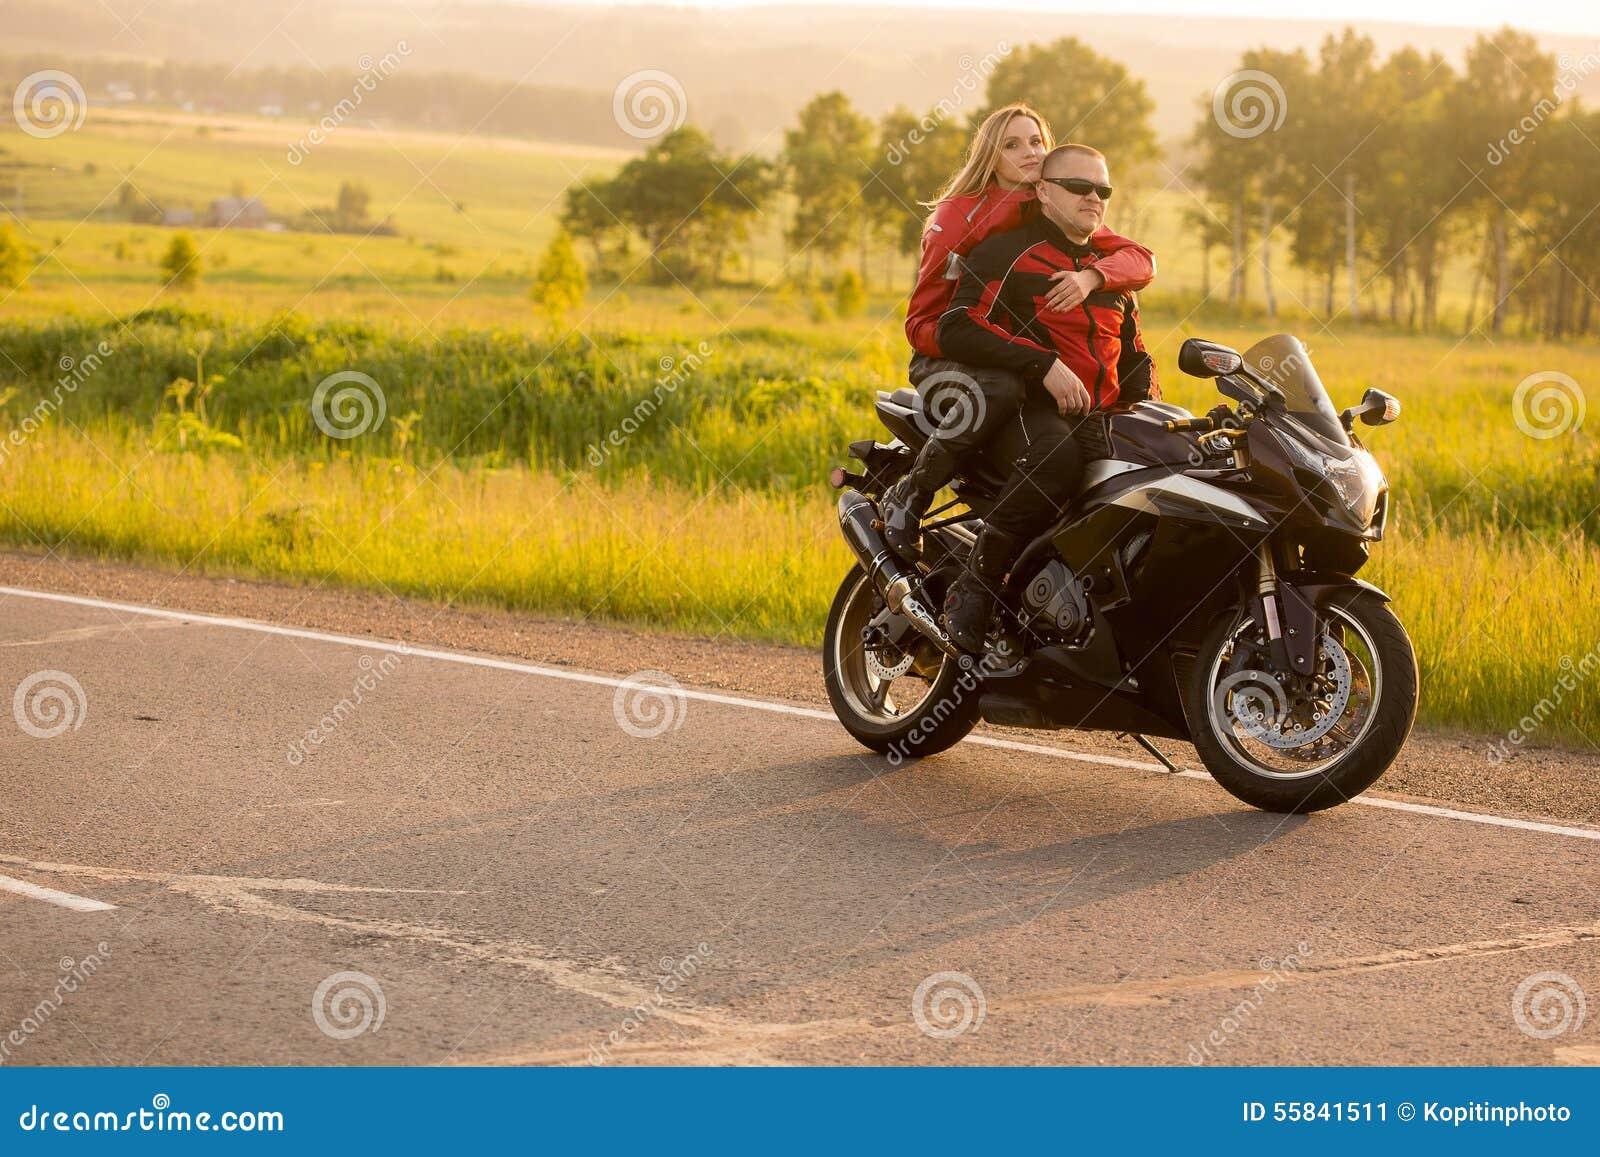 homme et femme de motard s 39 asseyant sur une moto image stock image du voyage people 55841511. Black Bedroom Furniture Sets. Home Design Ideas